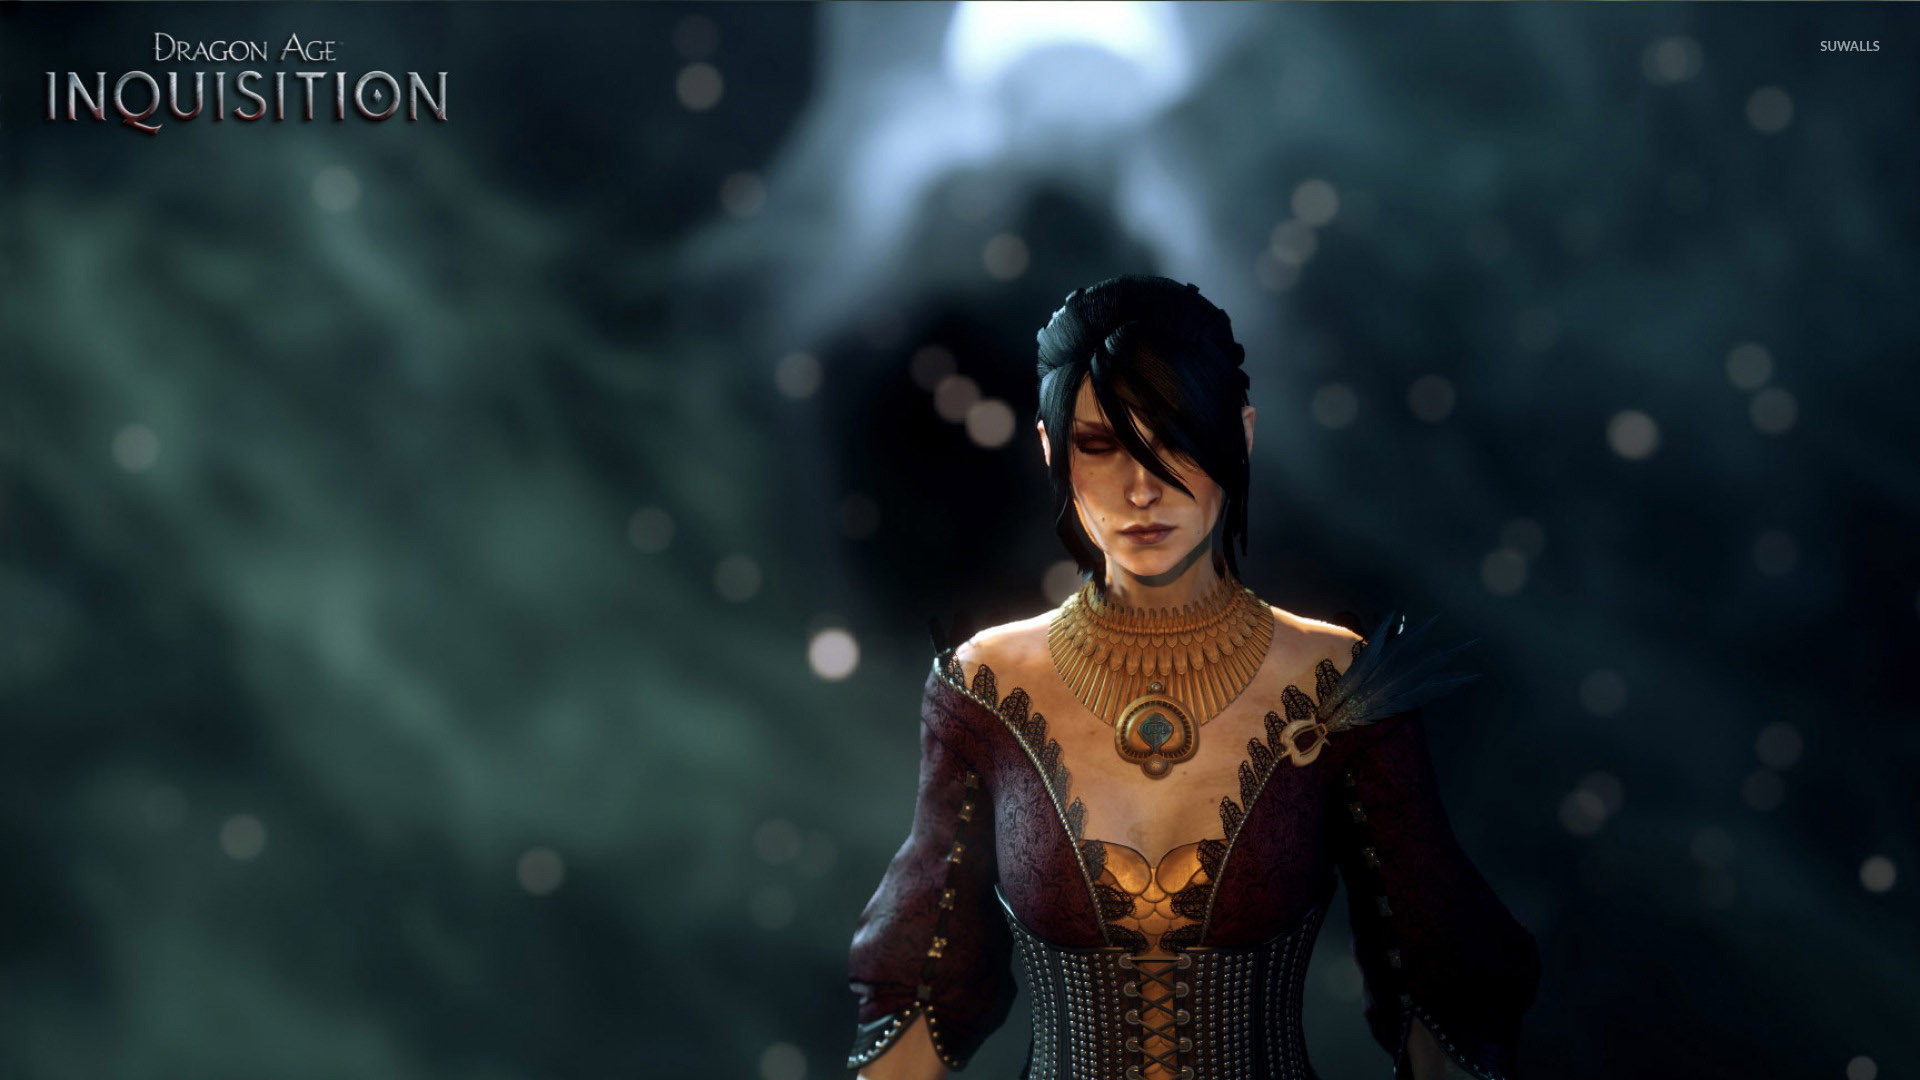 Dragon Age: Inquisition [7] wallpaper jpg